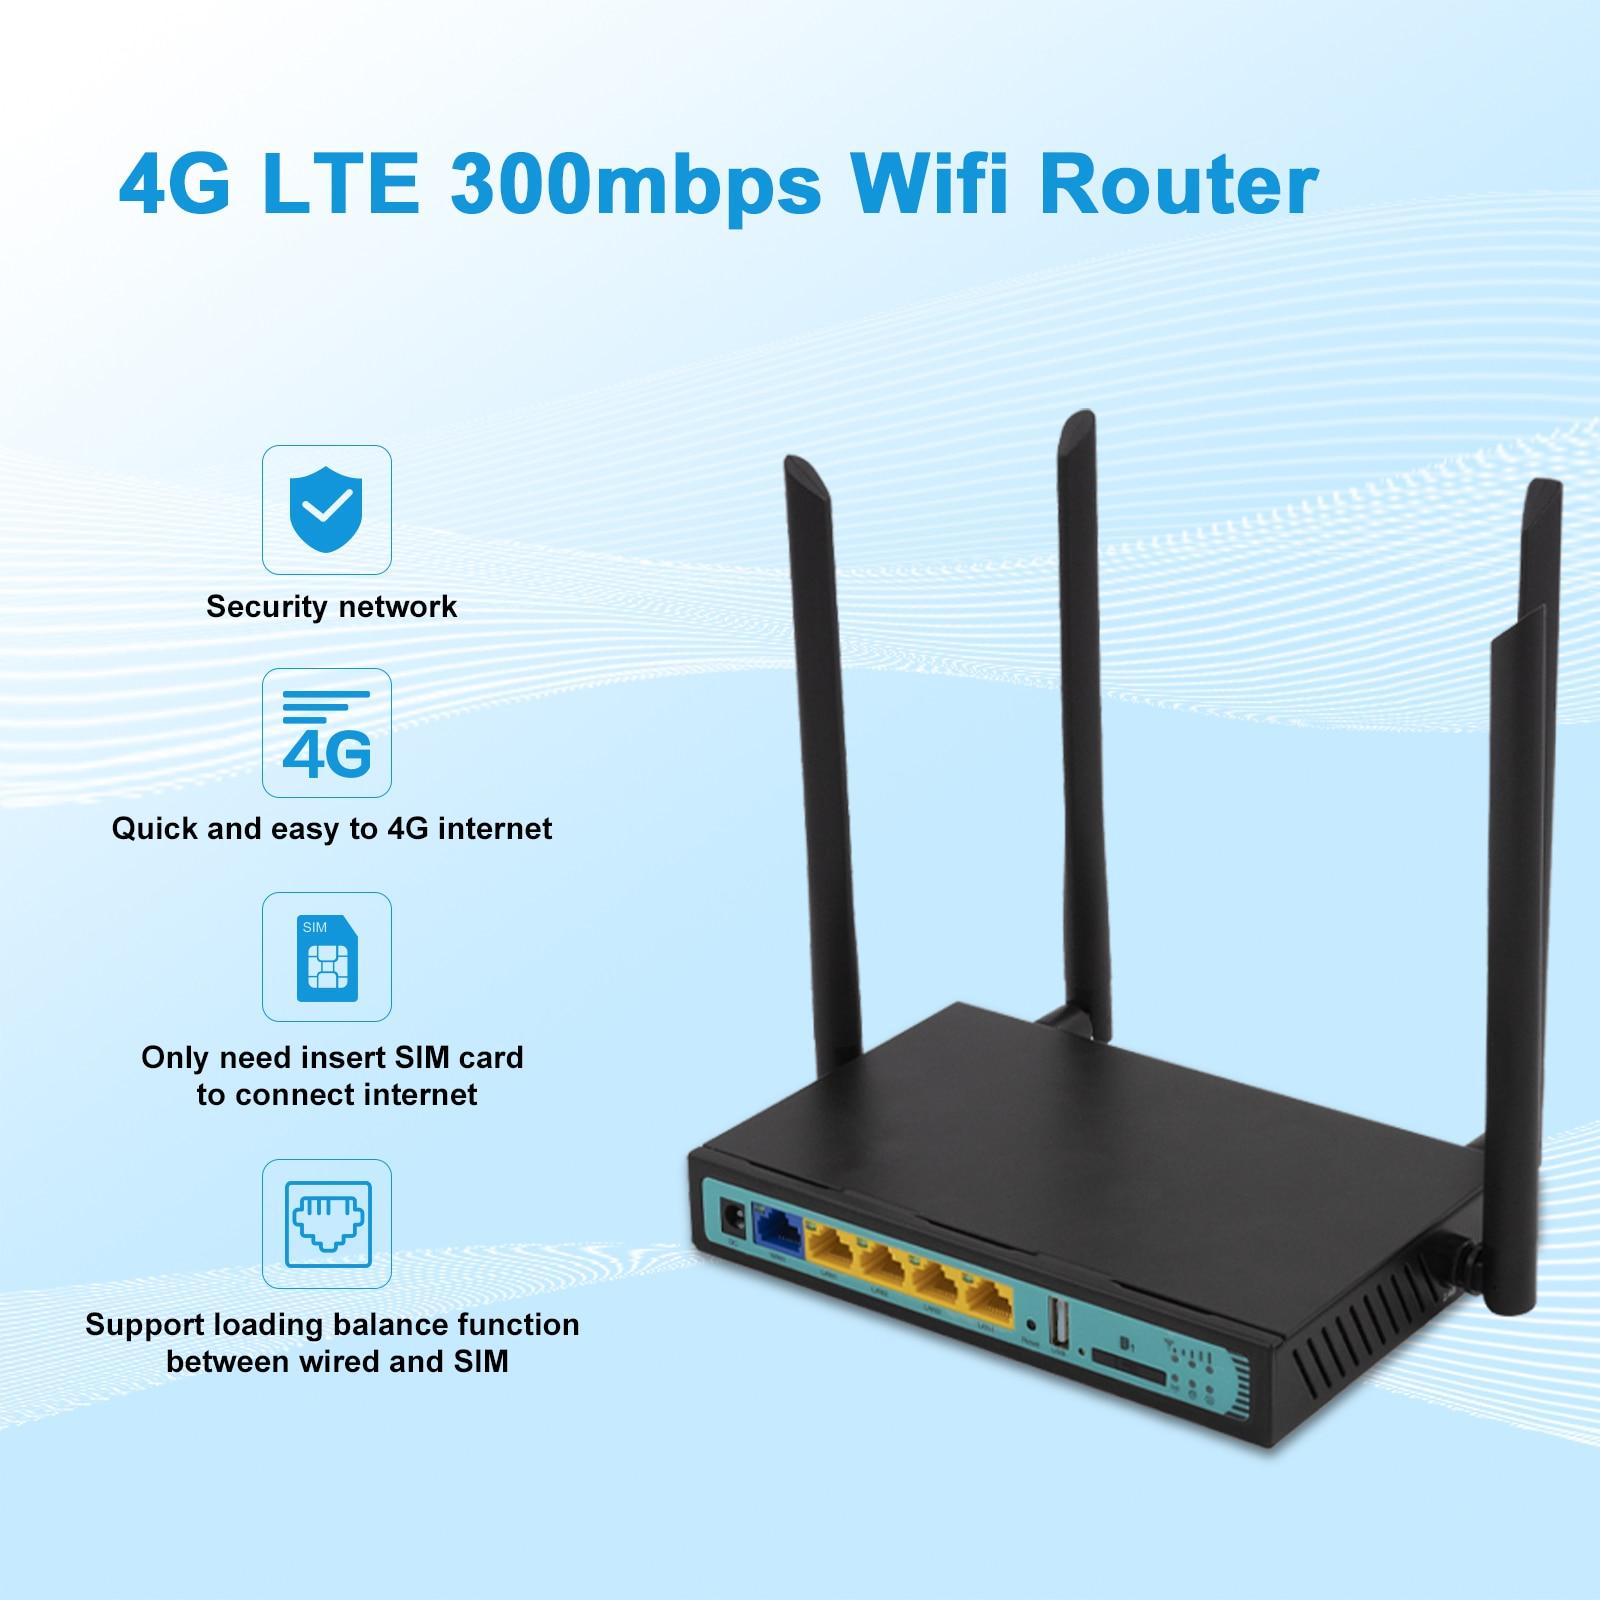 4G Wi-Fi Router 5Port Router With SIM Card USB WAP2 802.11n/u/b/g 300Mbps 2.4G Router LAN WAN 10/100M PCI-E Routet